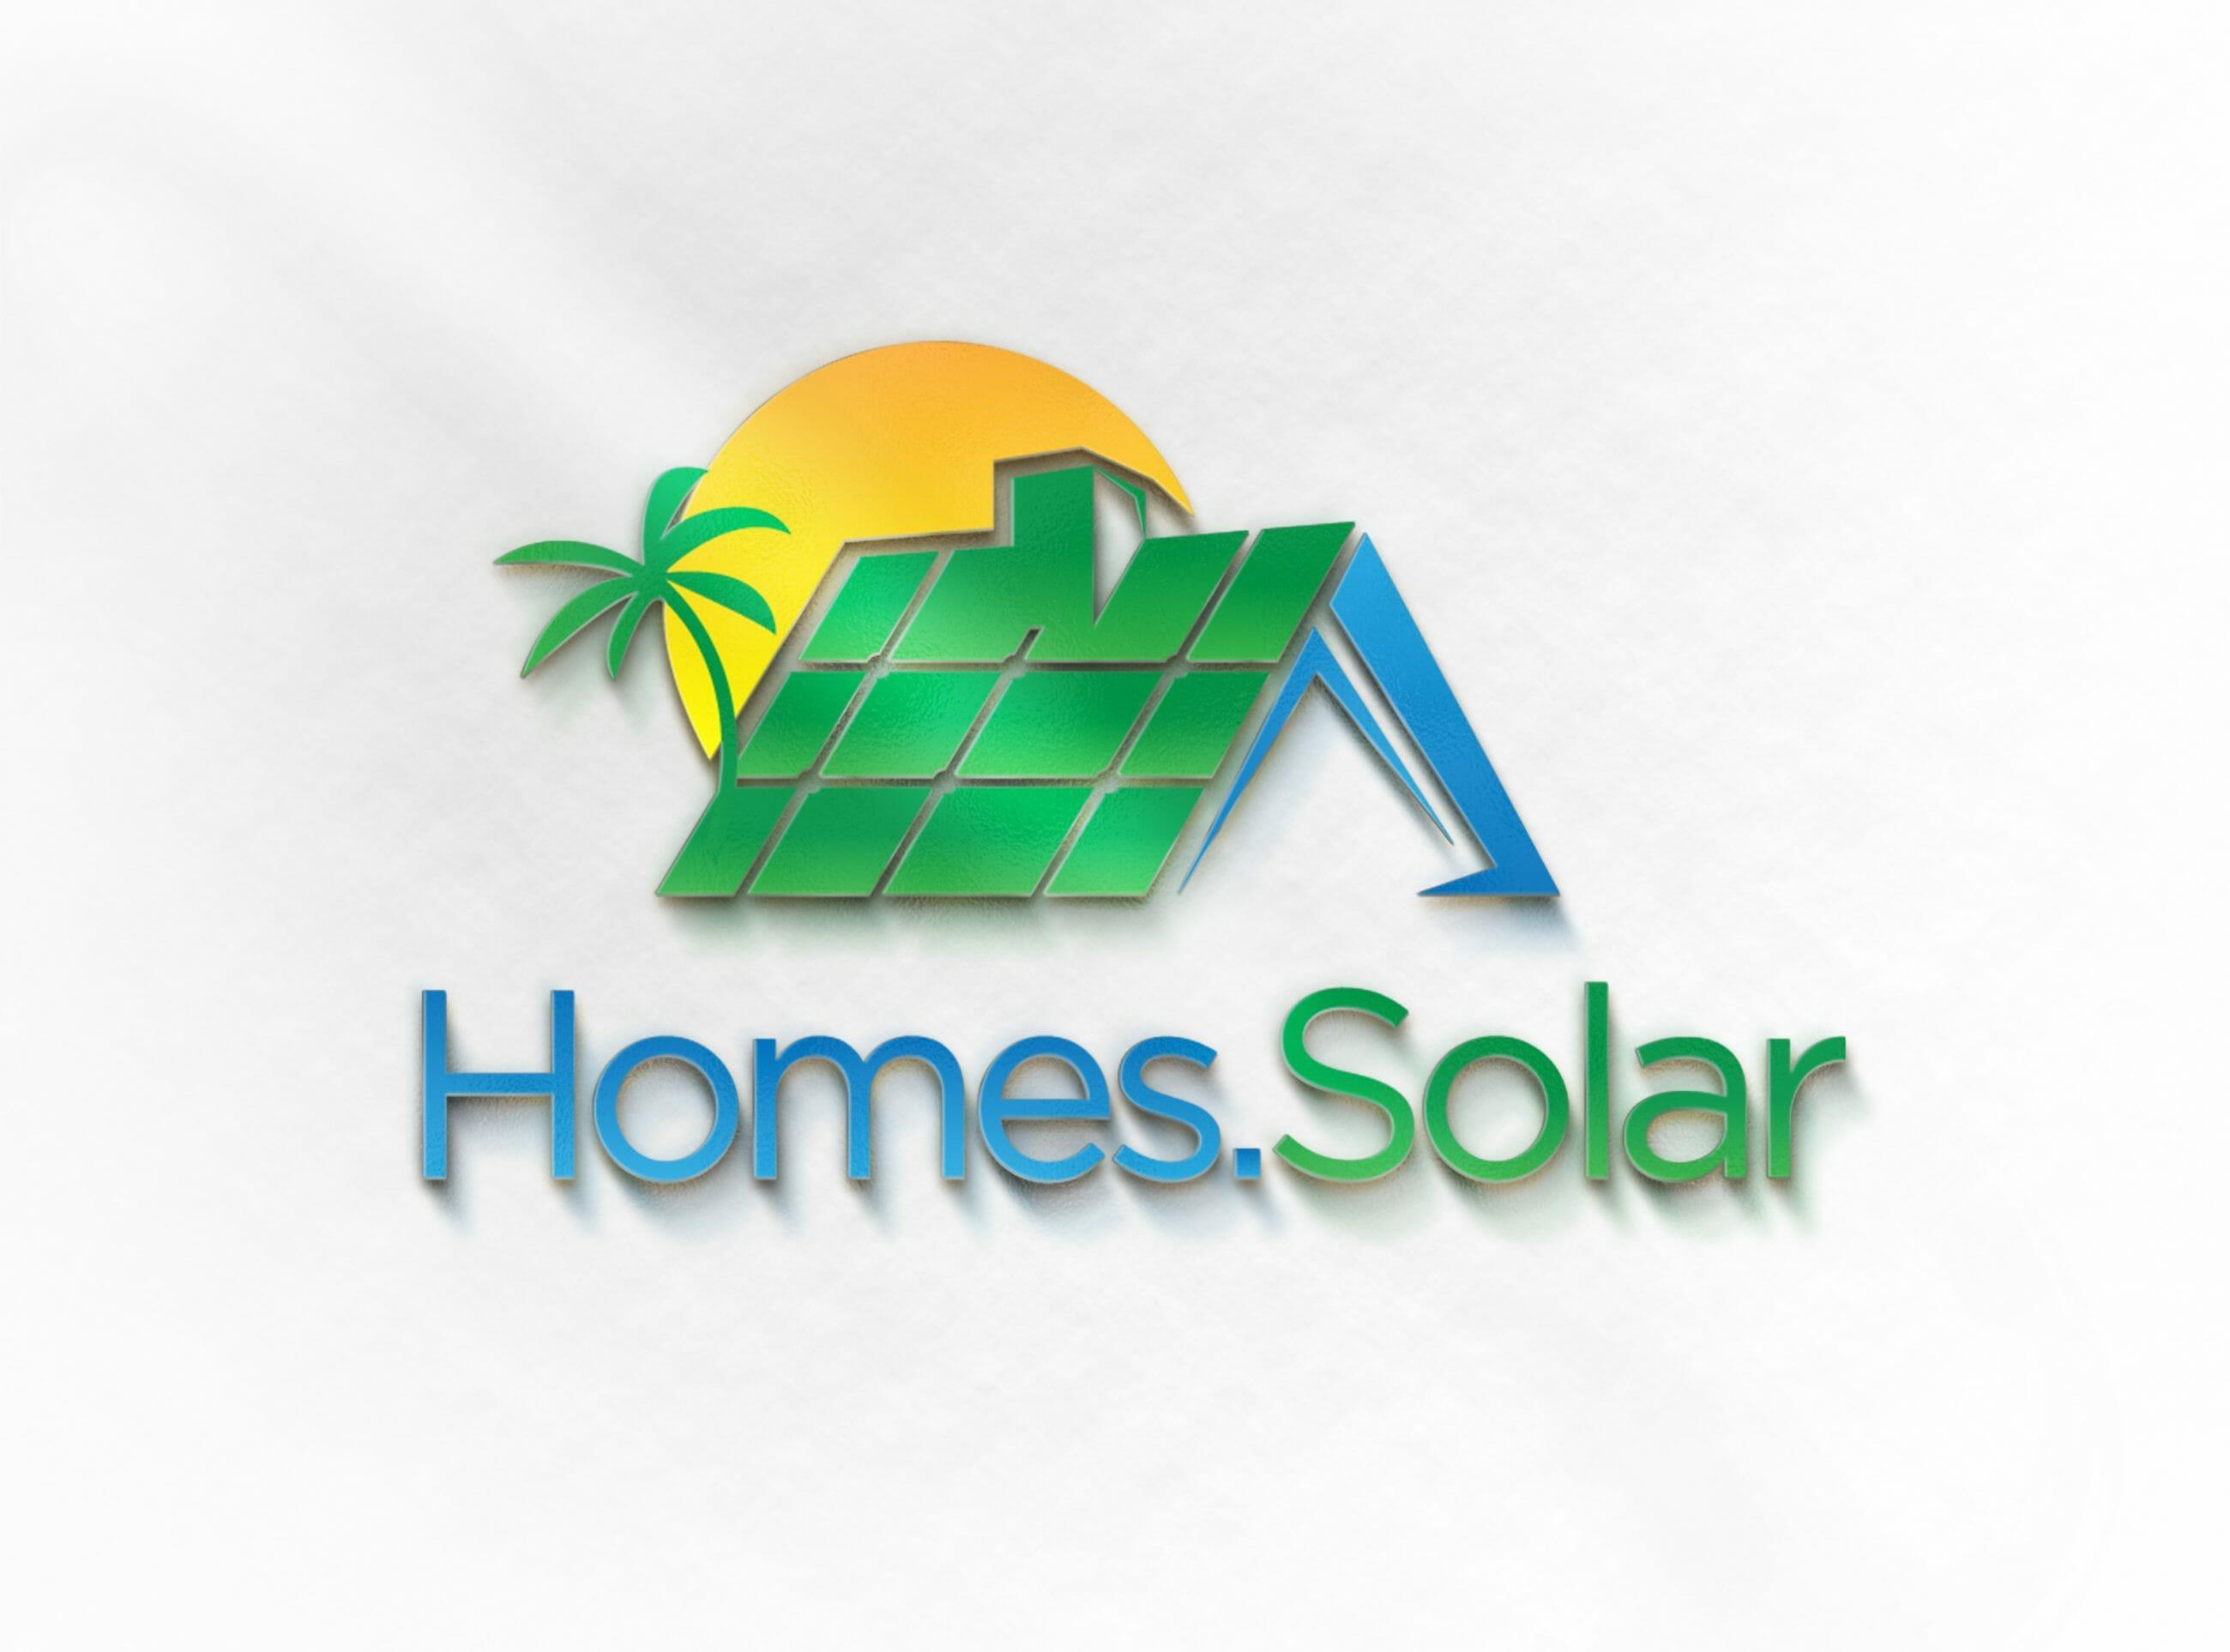 Homes.Solar